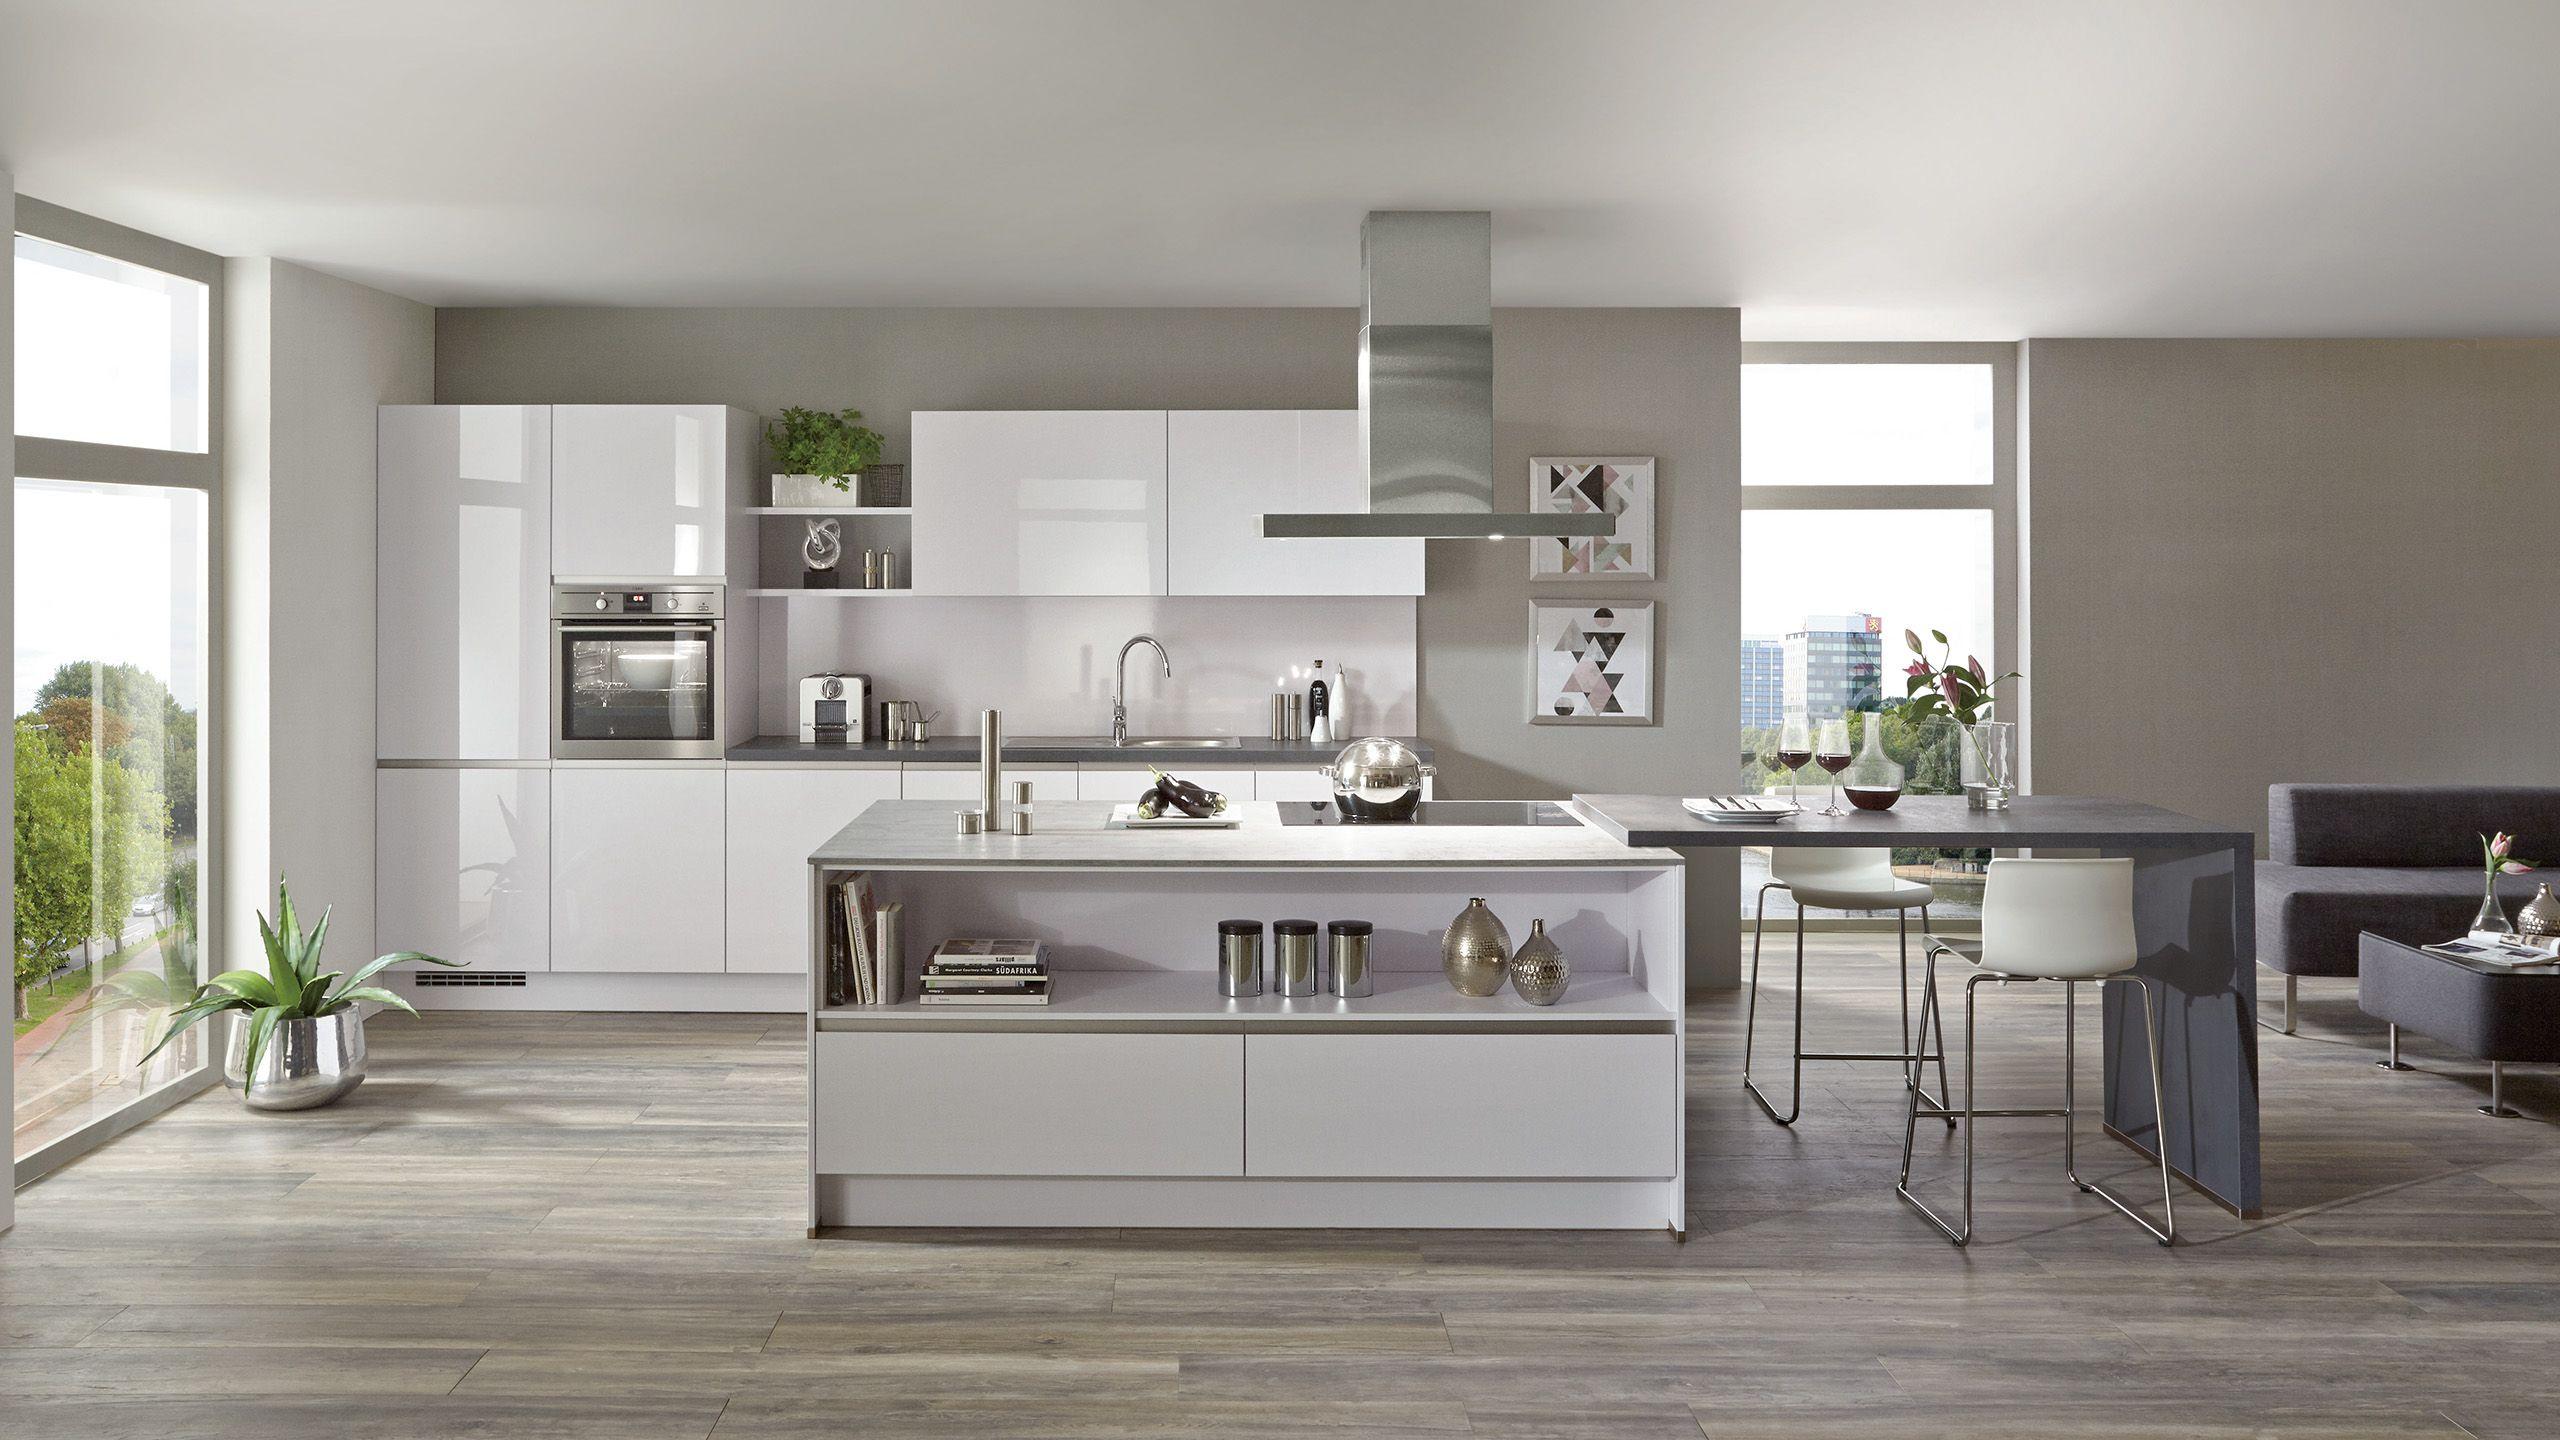 nobilia Küchen - nobilia | Produkte | Uni farbig | nobilia ...